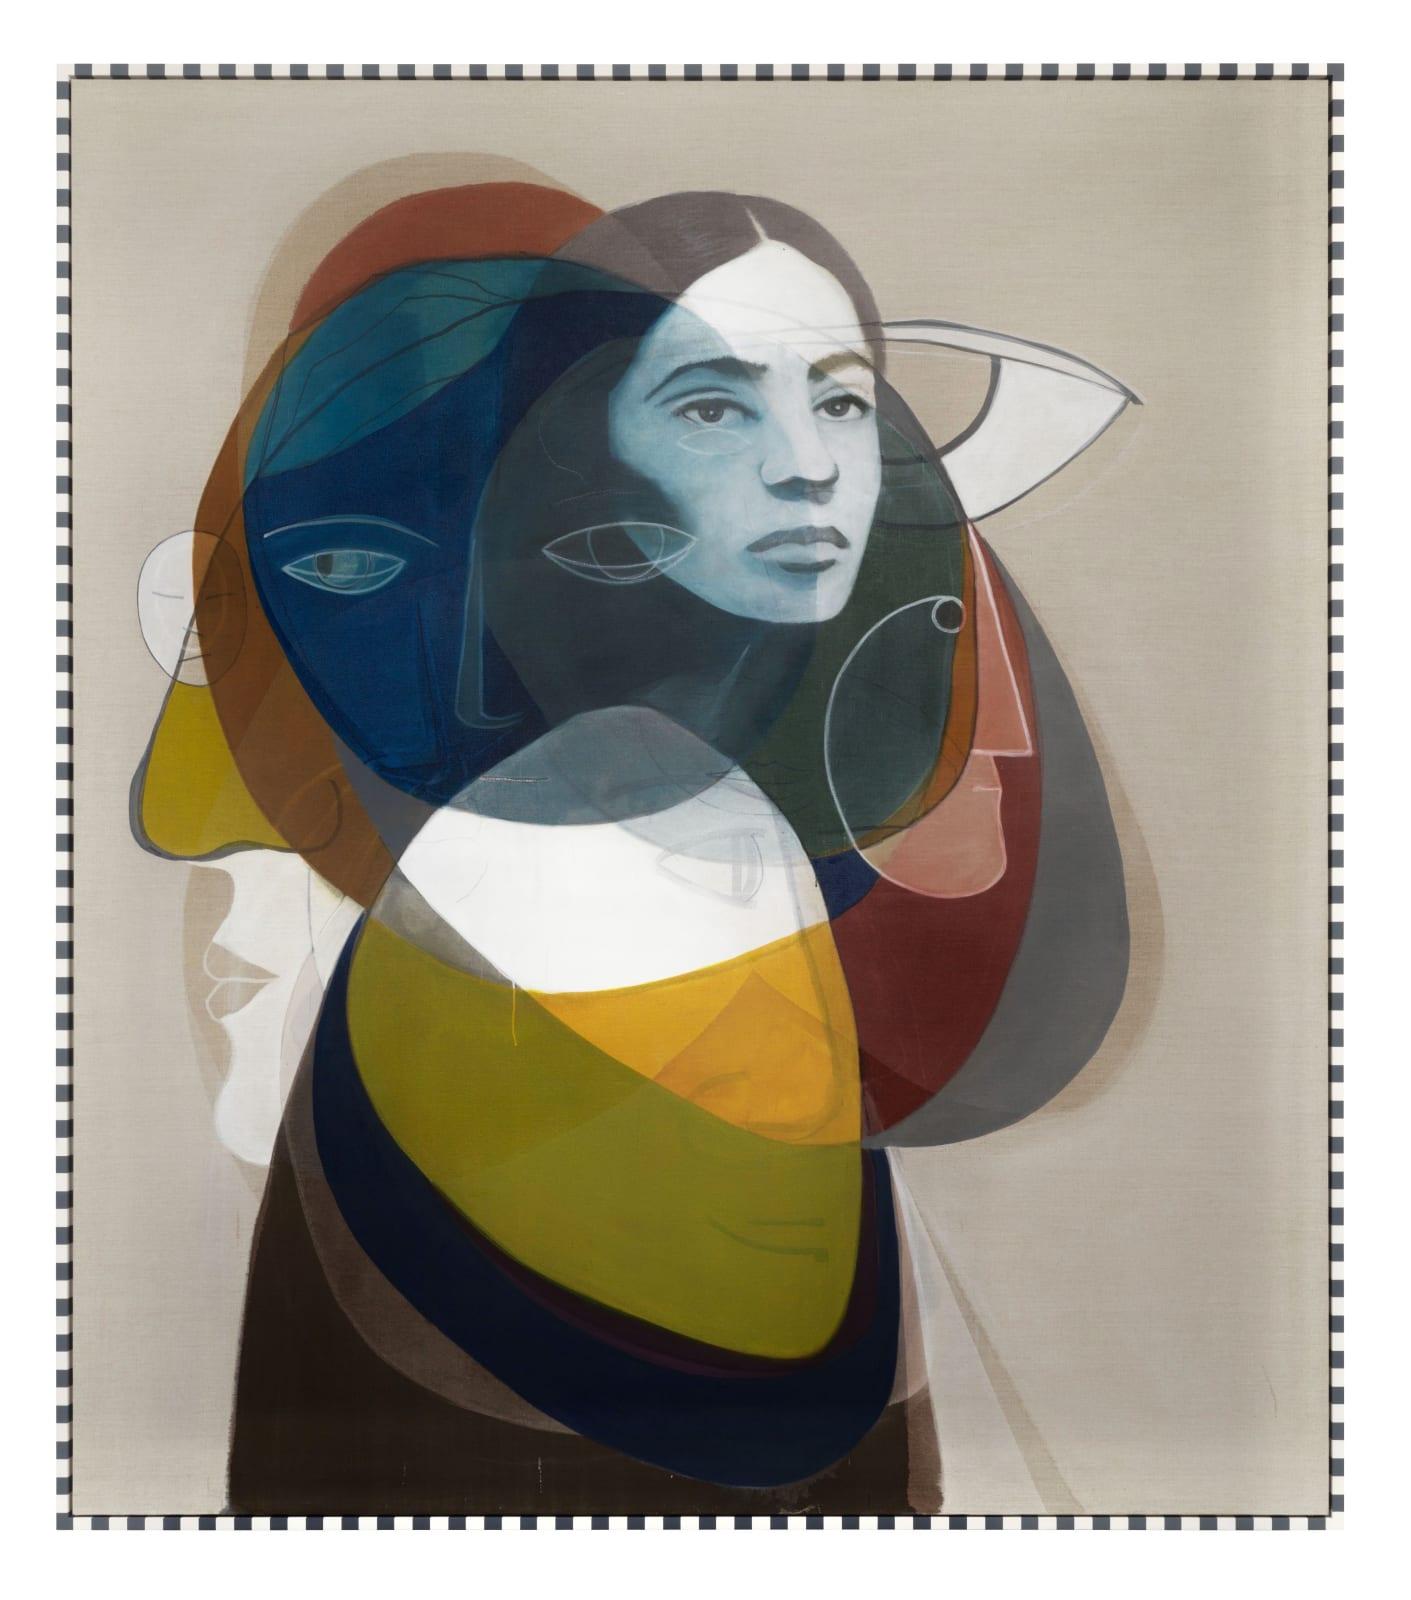 Matthias Bitzer, Layers of Alienation, 2018 | Marianne Boesky Gallery